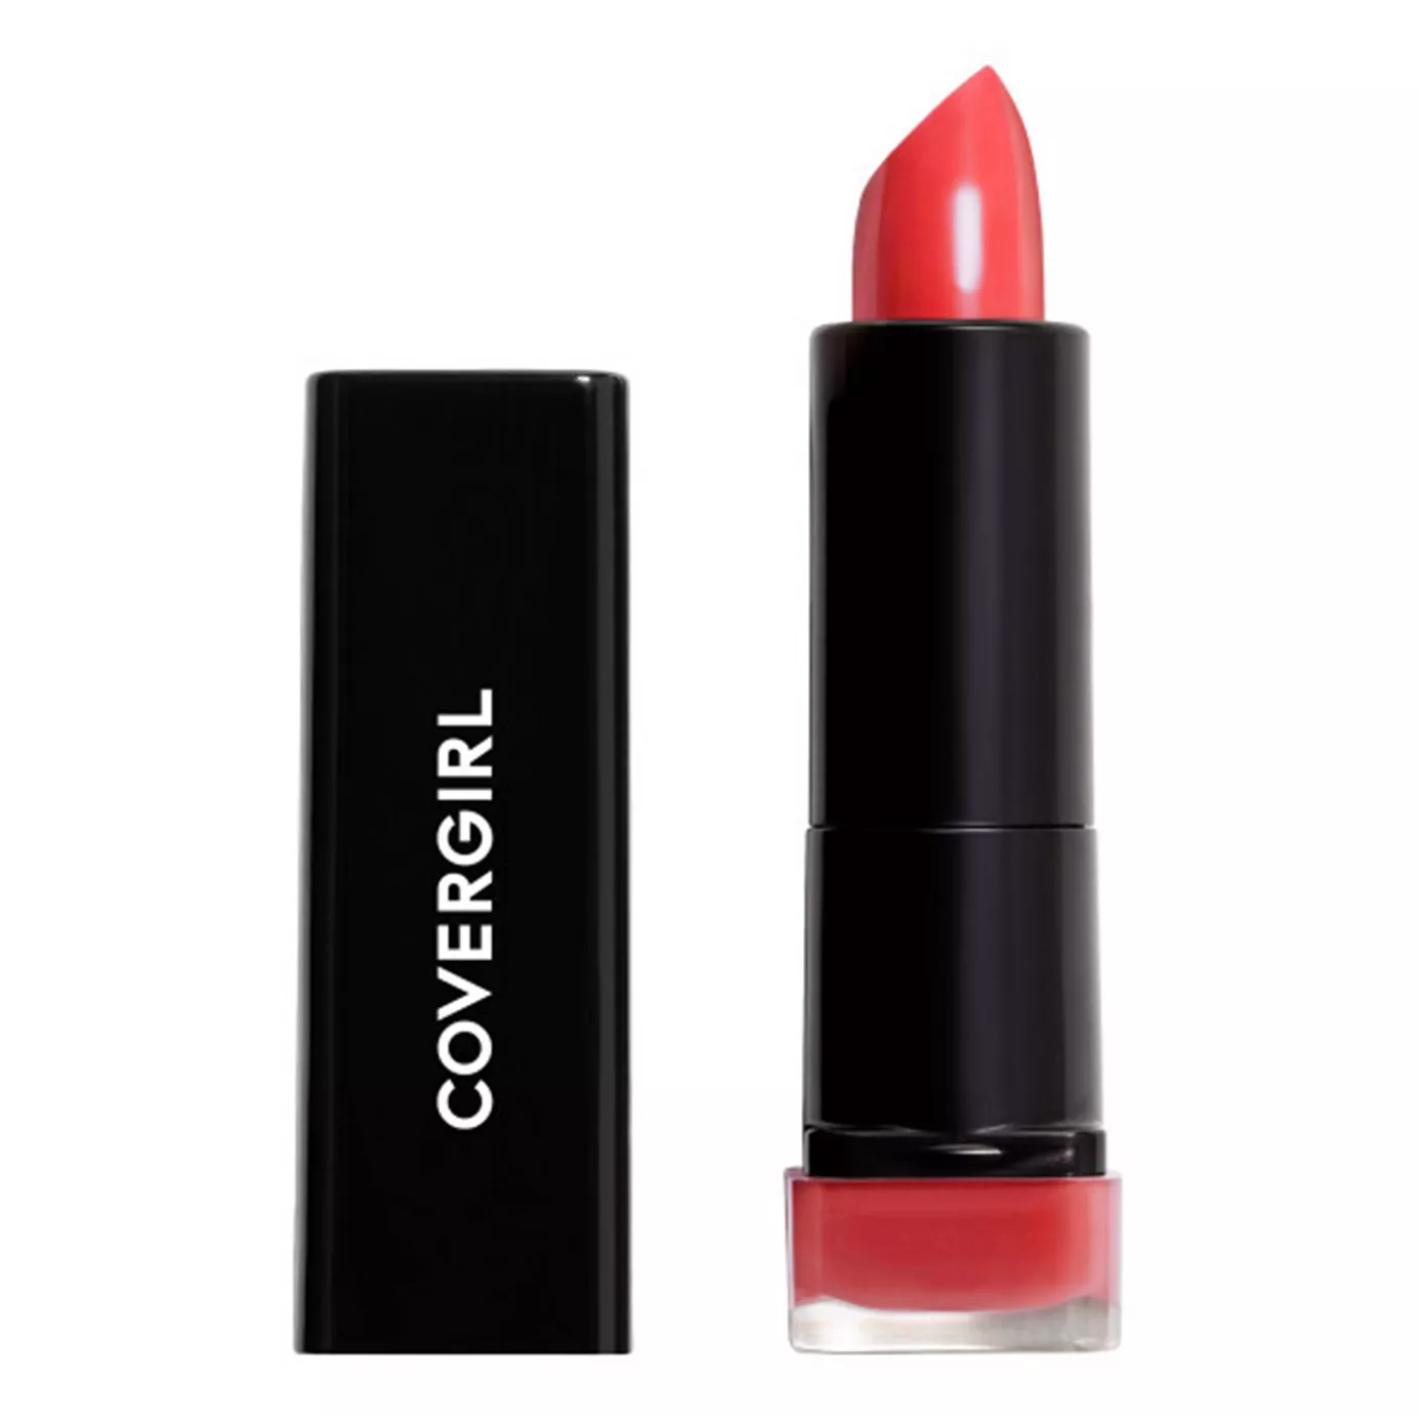 COVERGIRL Exhibitionist Cream Lipstick in Hot